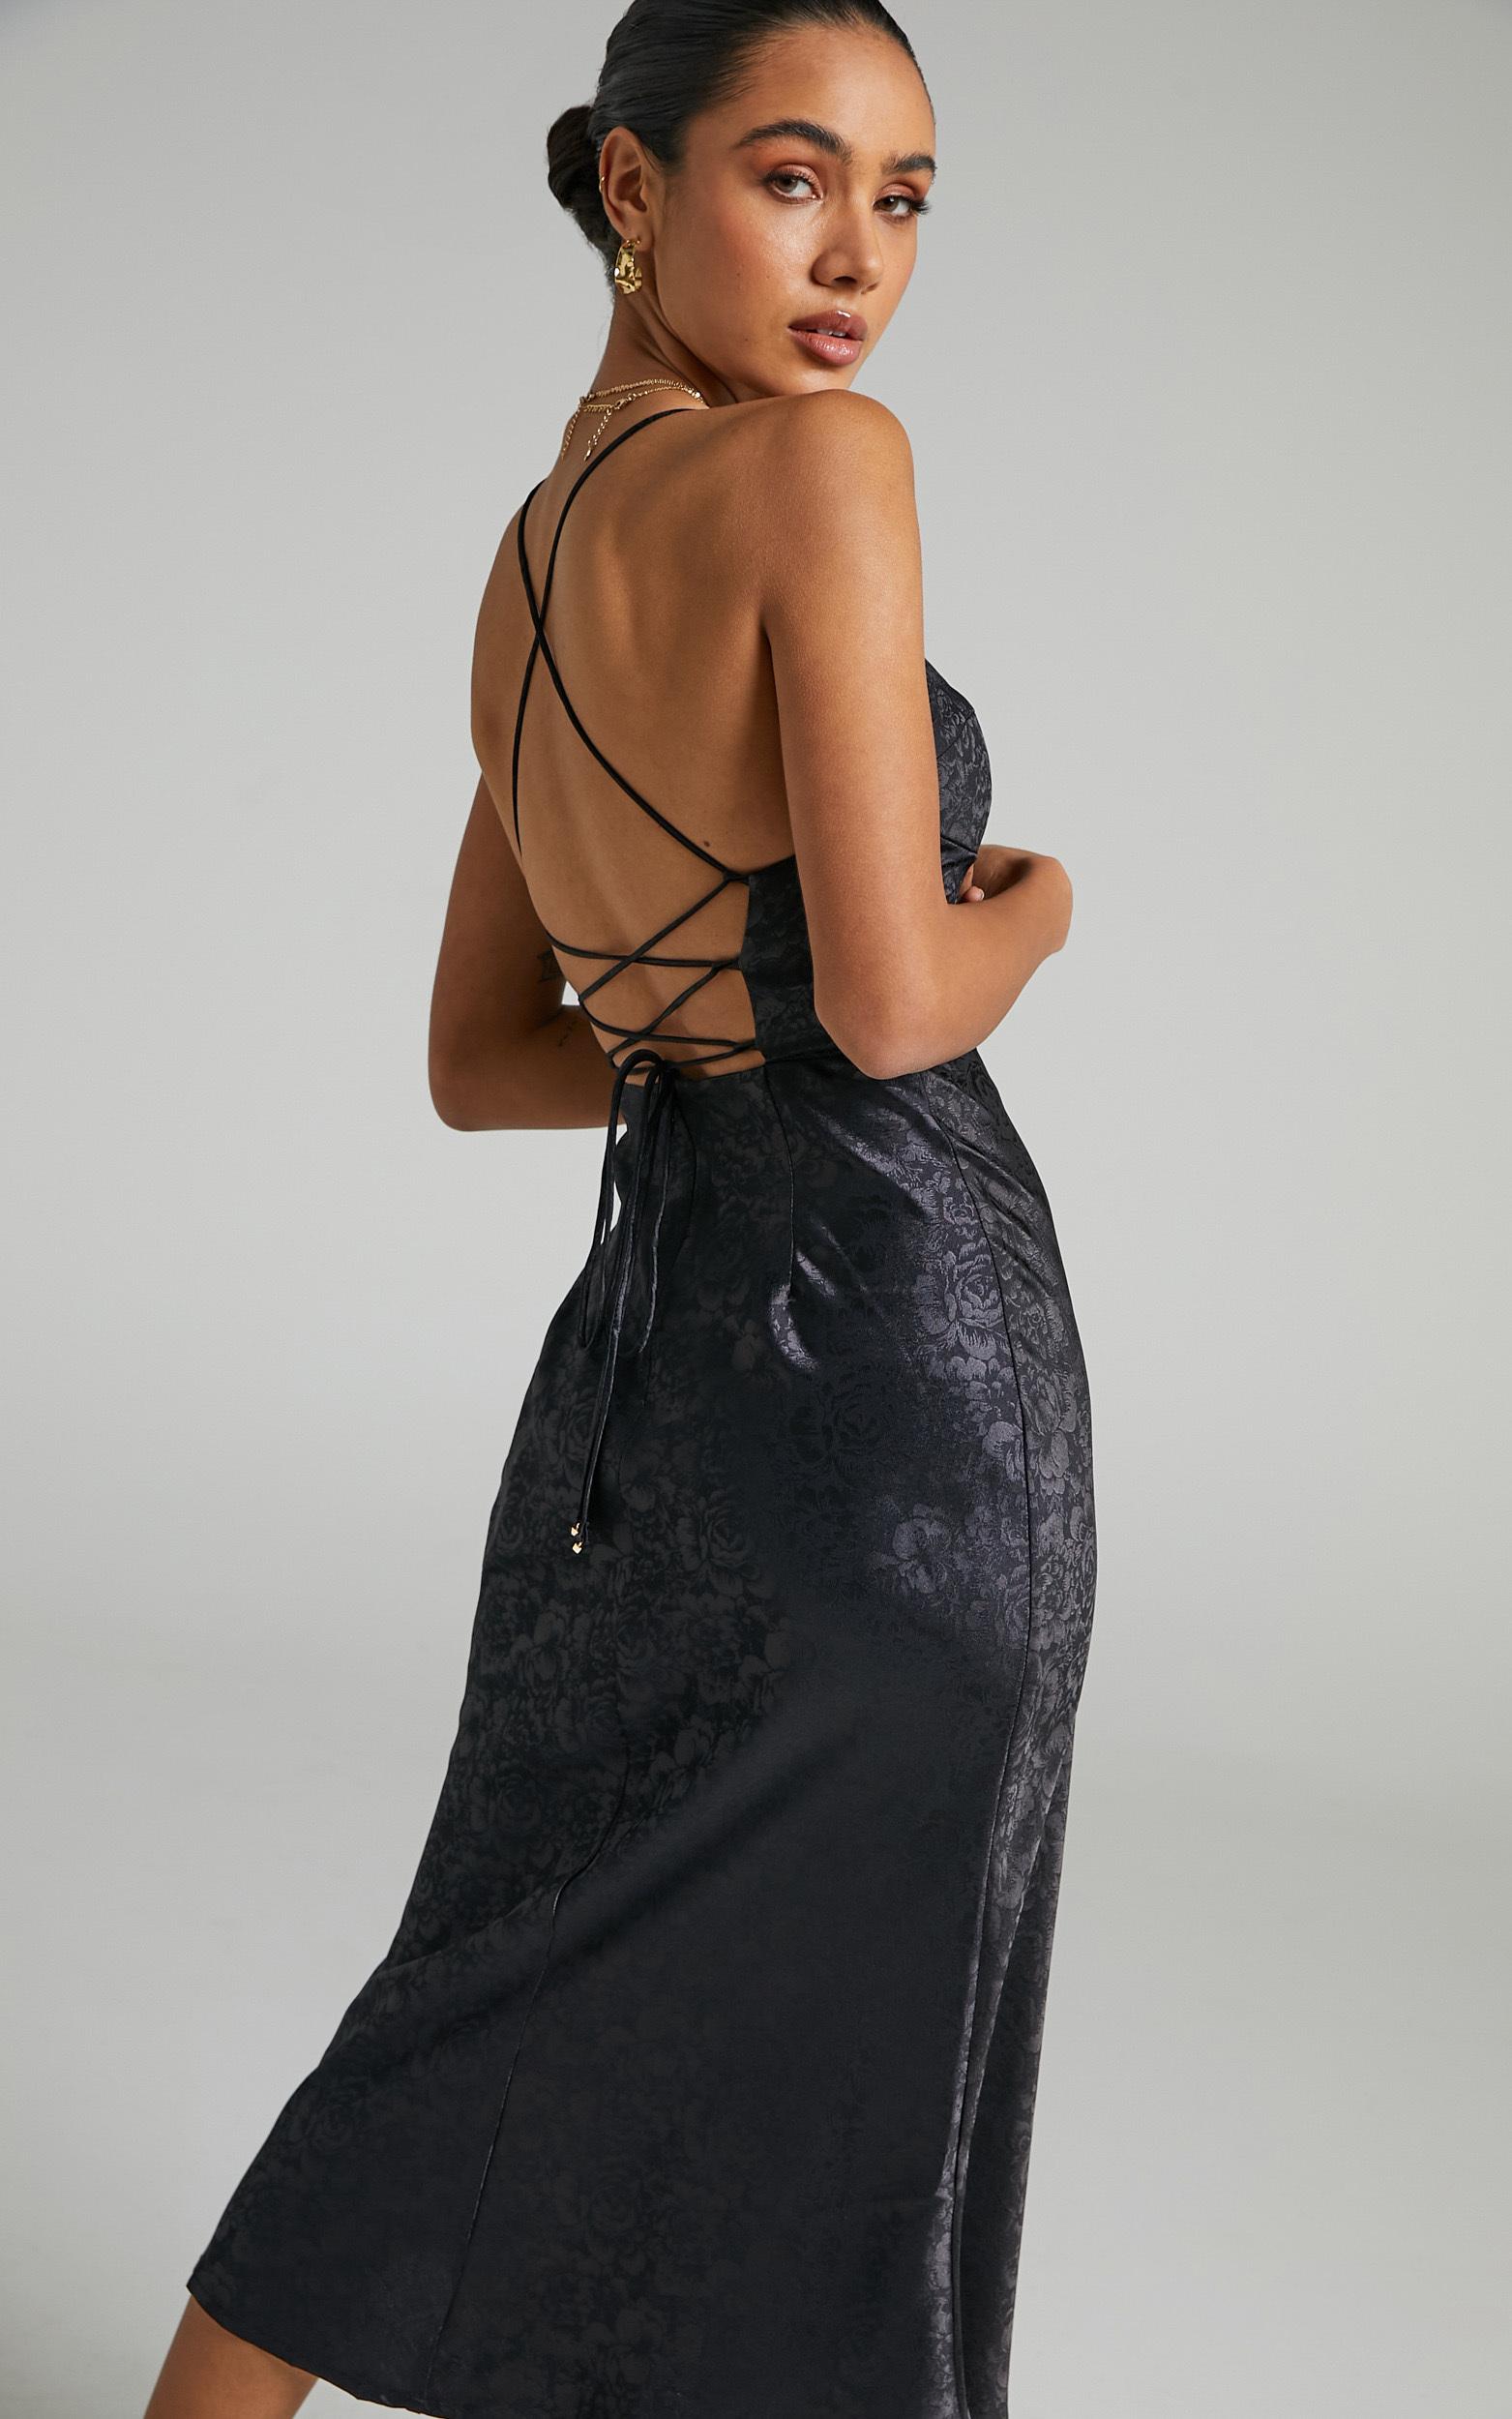 Runaway The Label - Electra Slip Dress in Black - L, BLK1, hi-res image number null